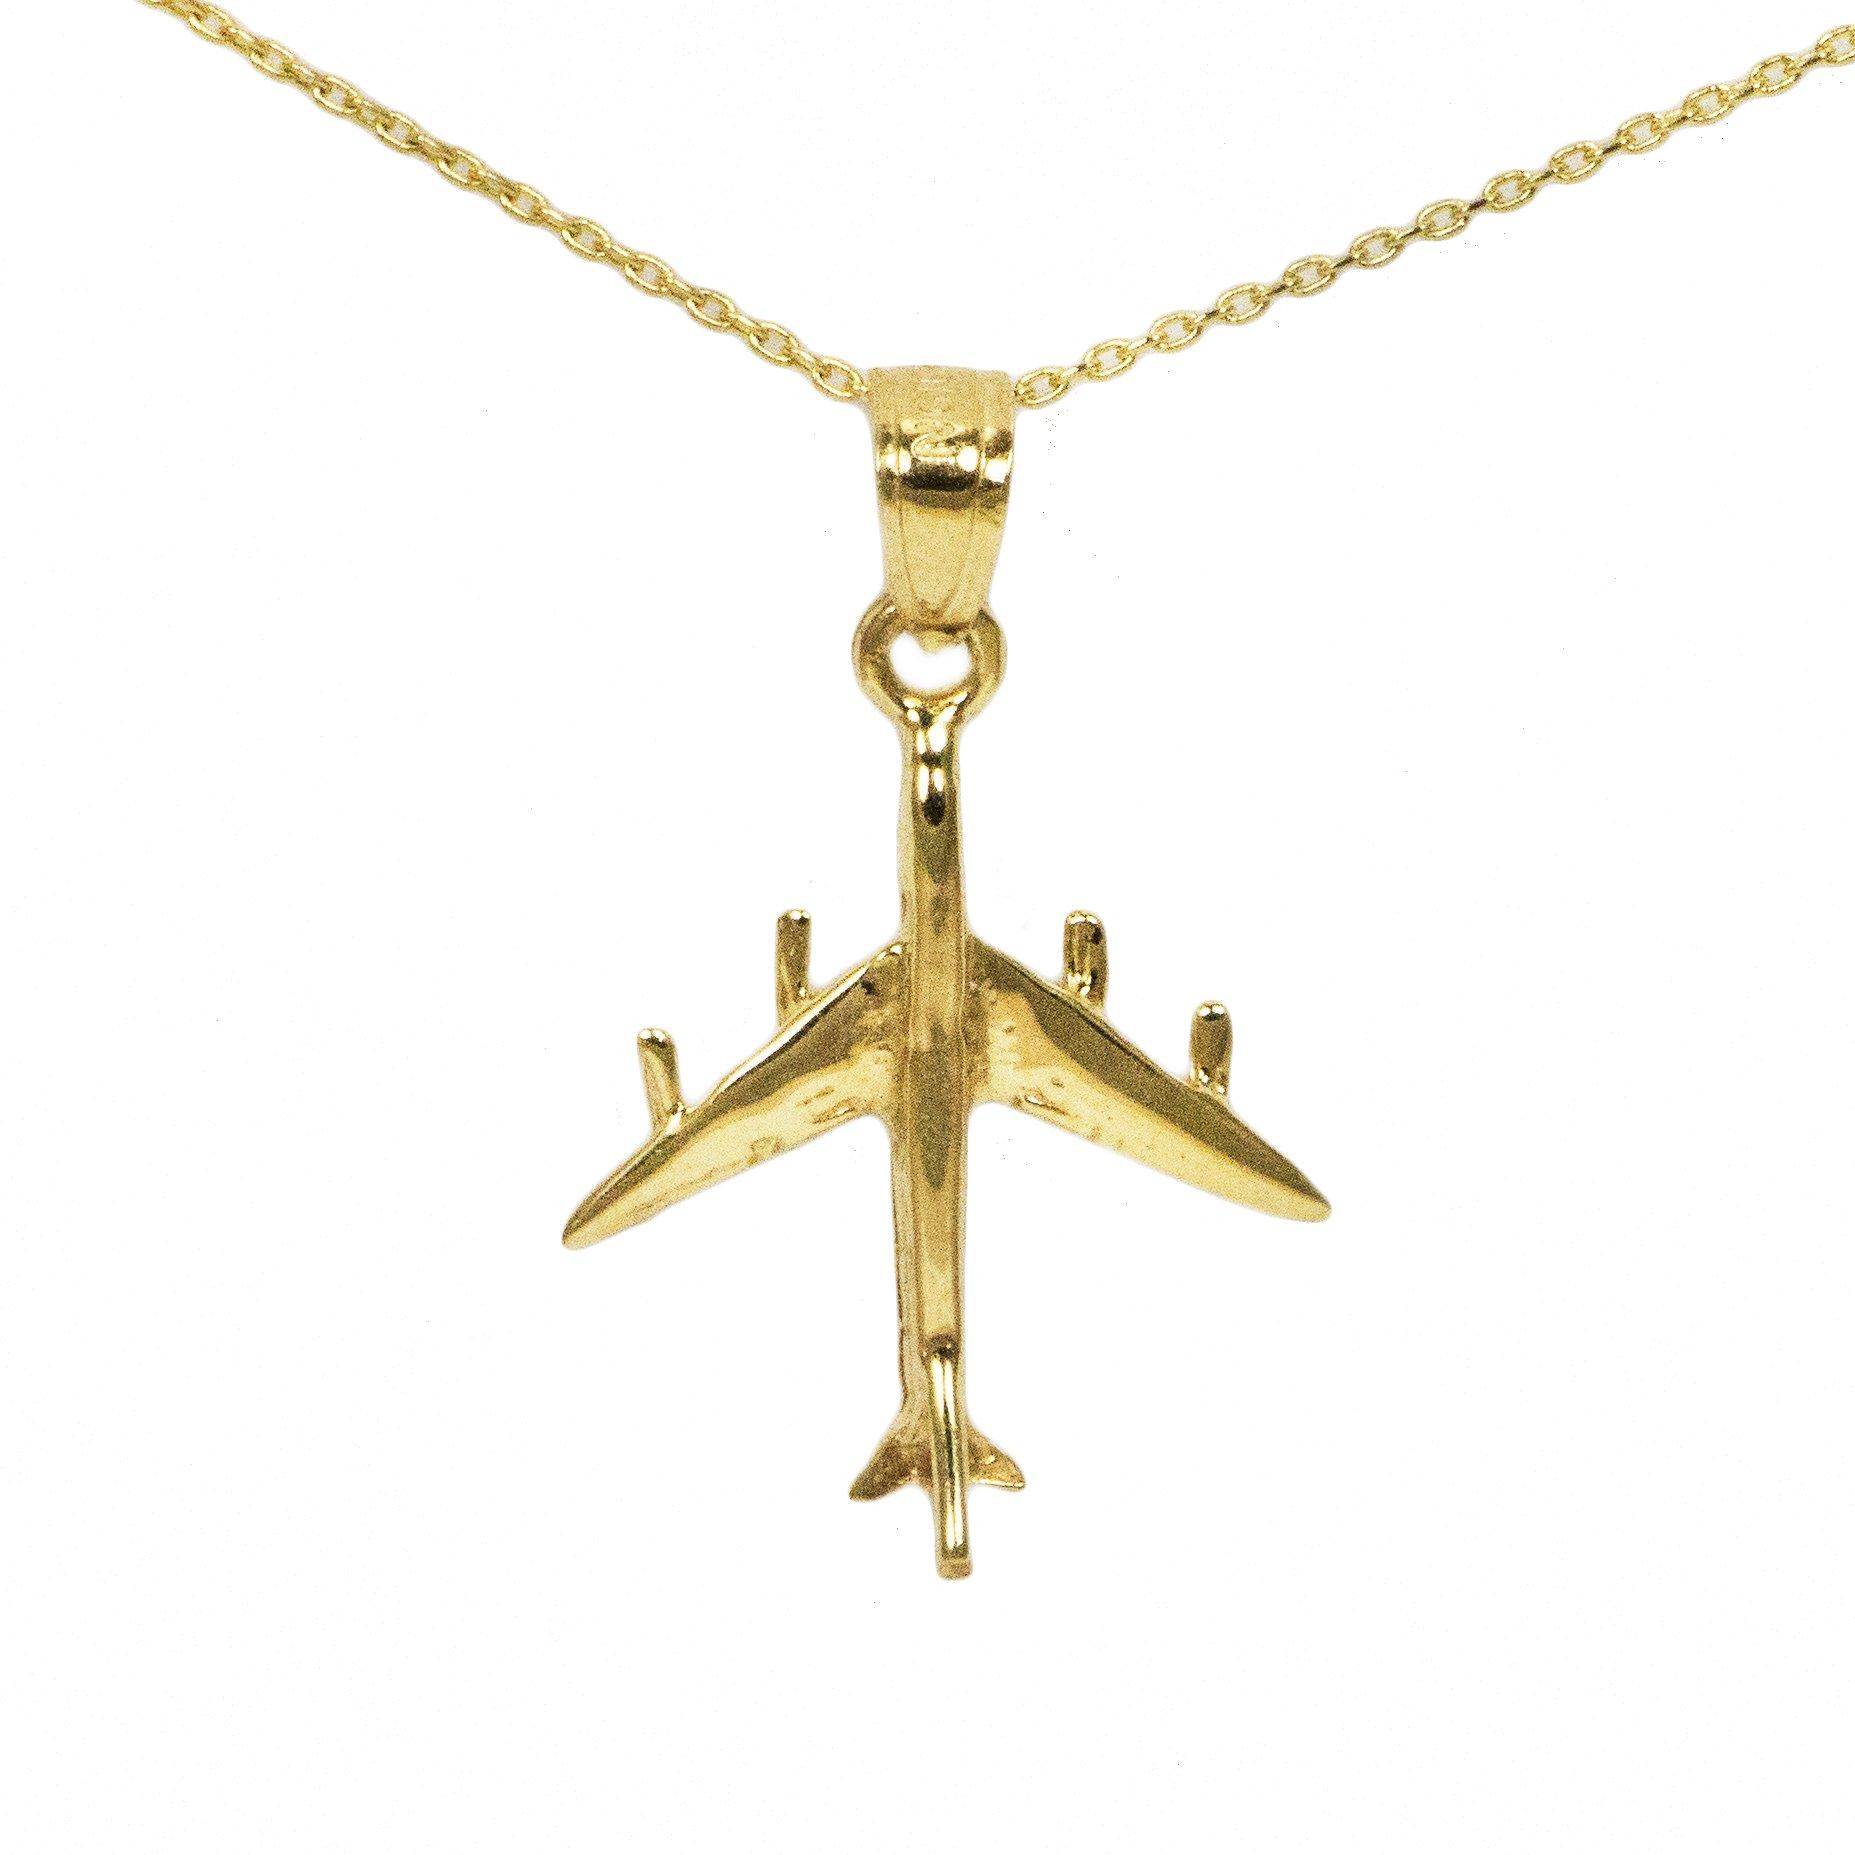 14k Yellow Gold Airplane Pendant